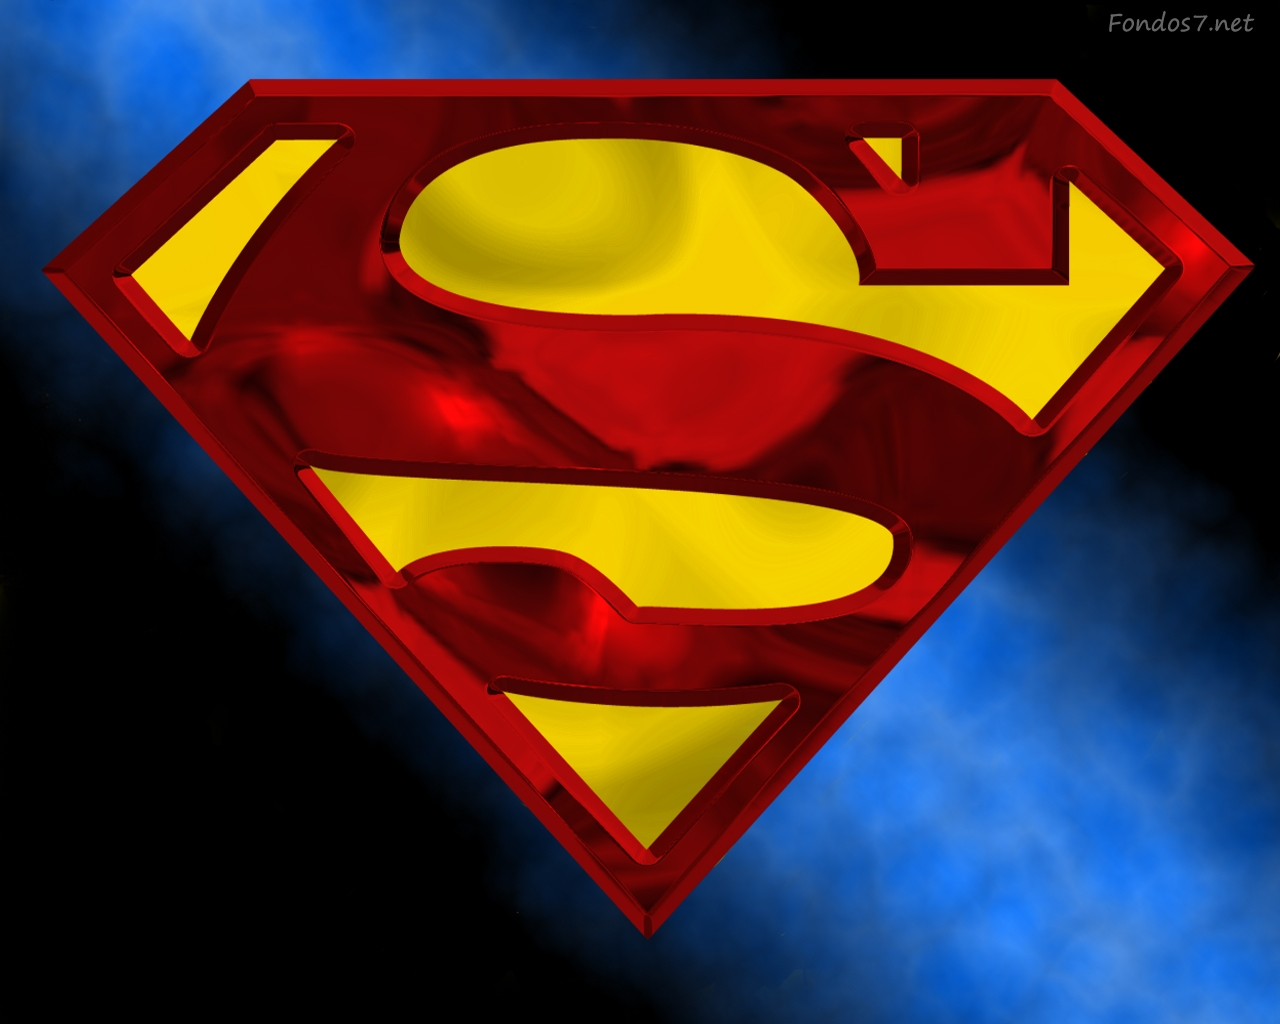 Superman Wallpaper Widescreen Wide Screen Wallpaper 1080p2K4K 1280x1024